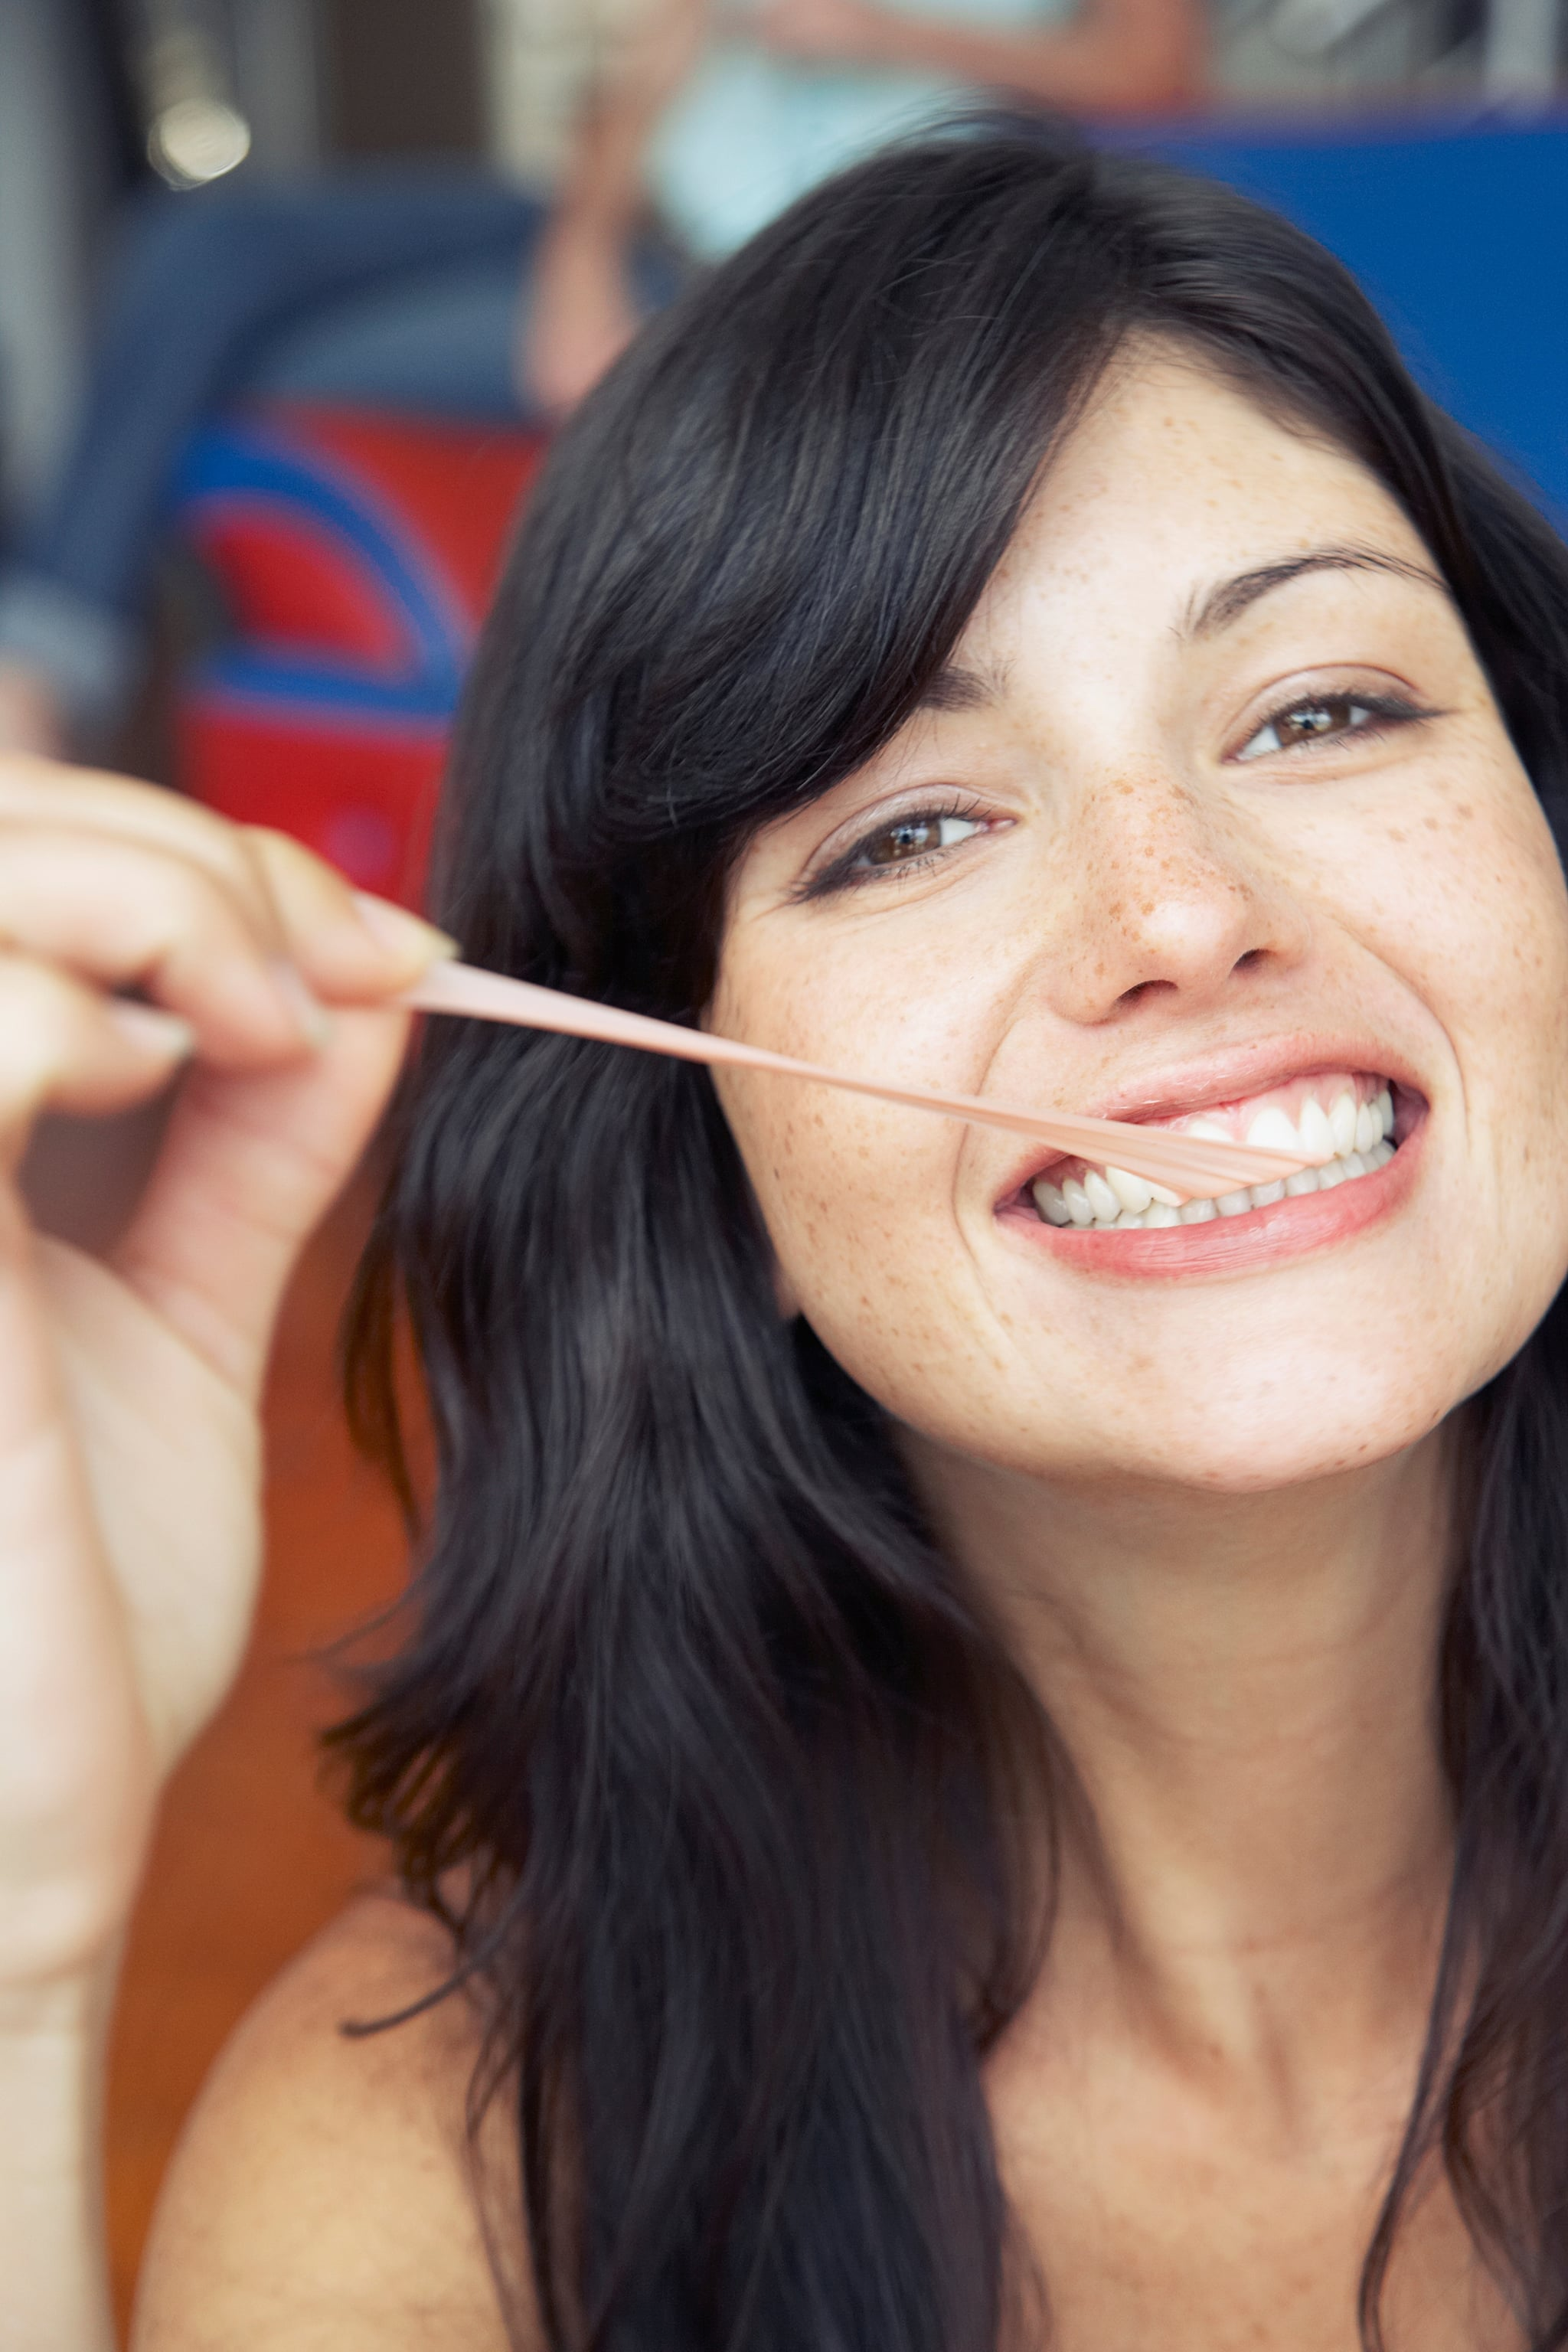 Can I Chew Gum While Intermittent Fasting?   POPSUGAR Fitness Australia